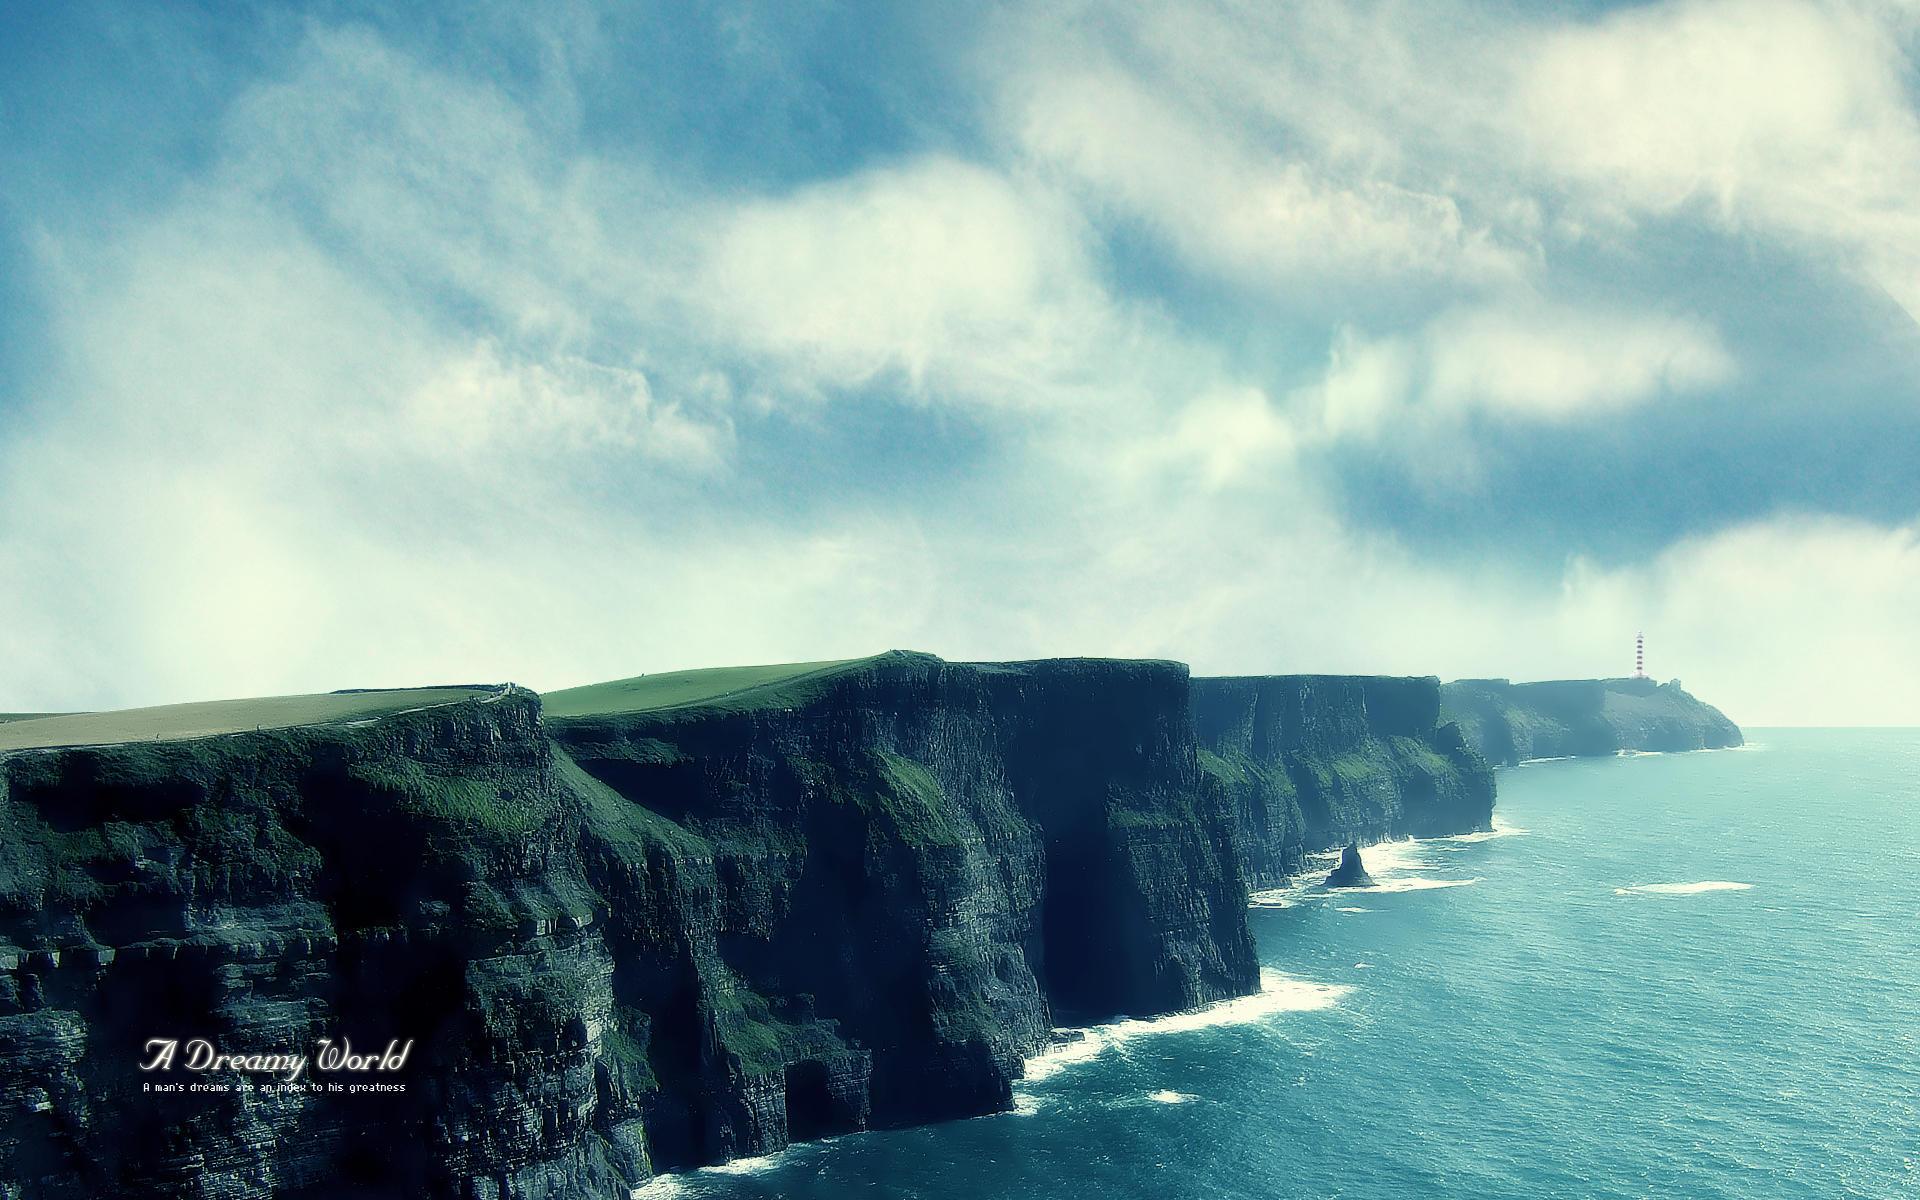 A dreamy world - 2 by bo0xVn